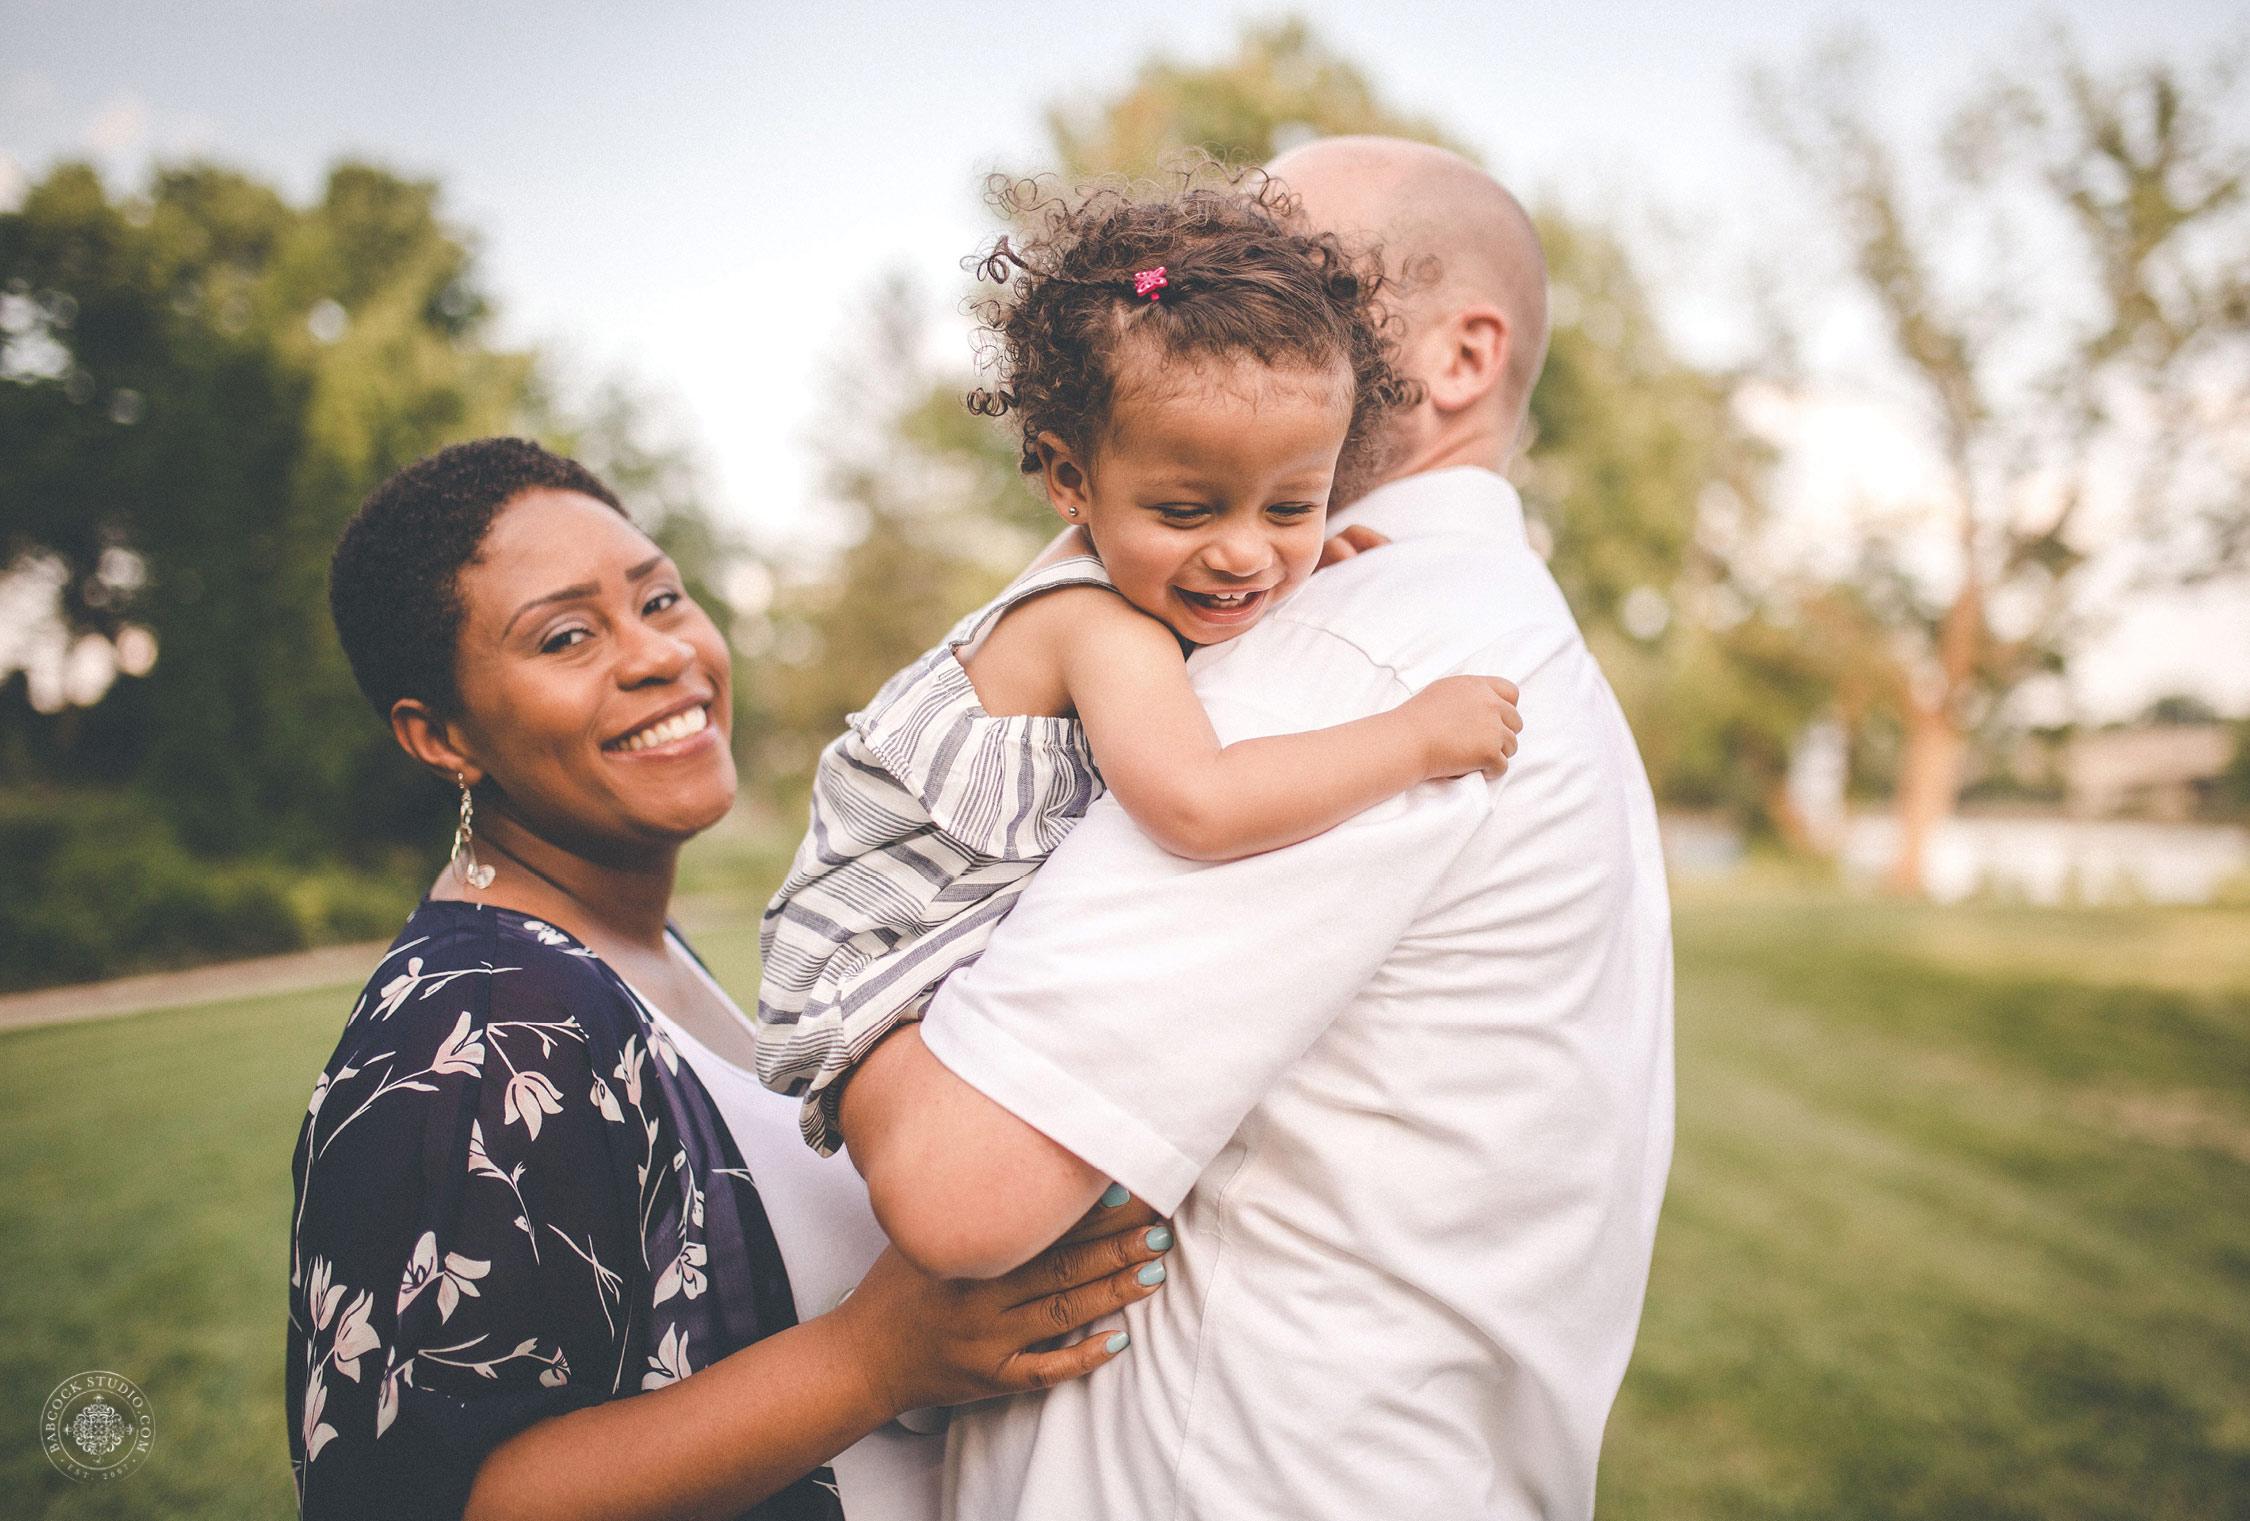 brande-langston-maternity-pregnancy-photographer-dayton-ohio-6.jpg